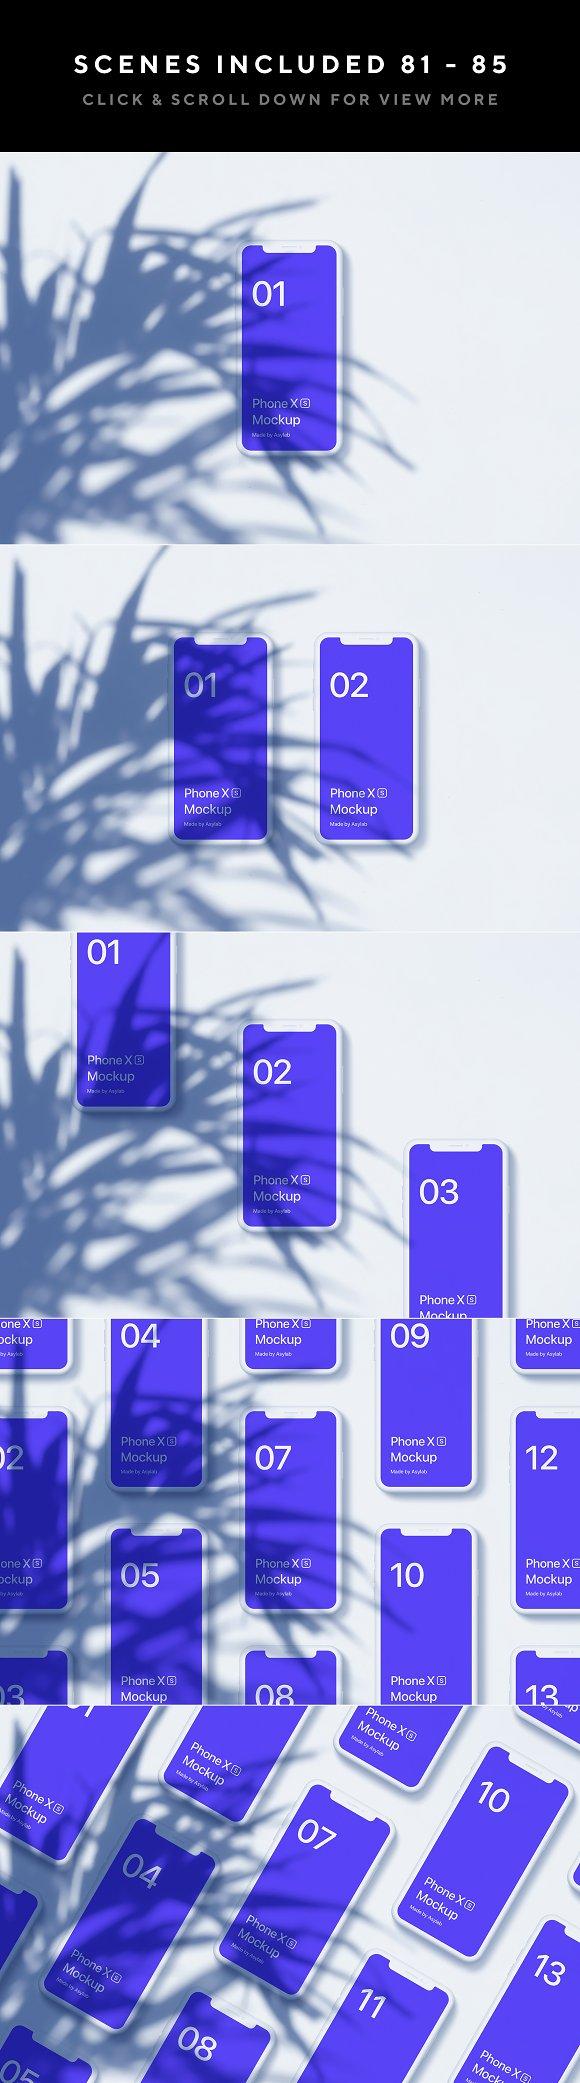 100 Branding Stationery Mockups in Branding Mockups - product preview 37